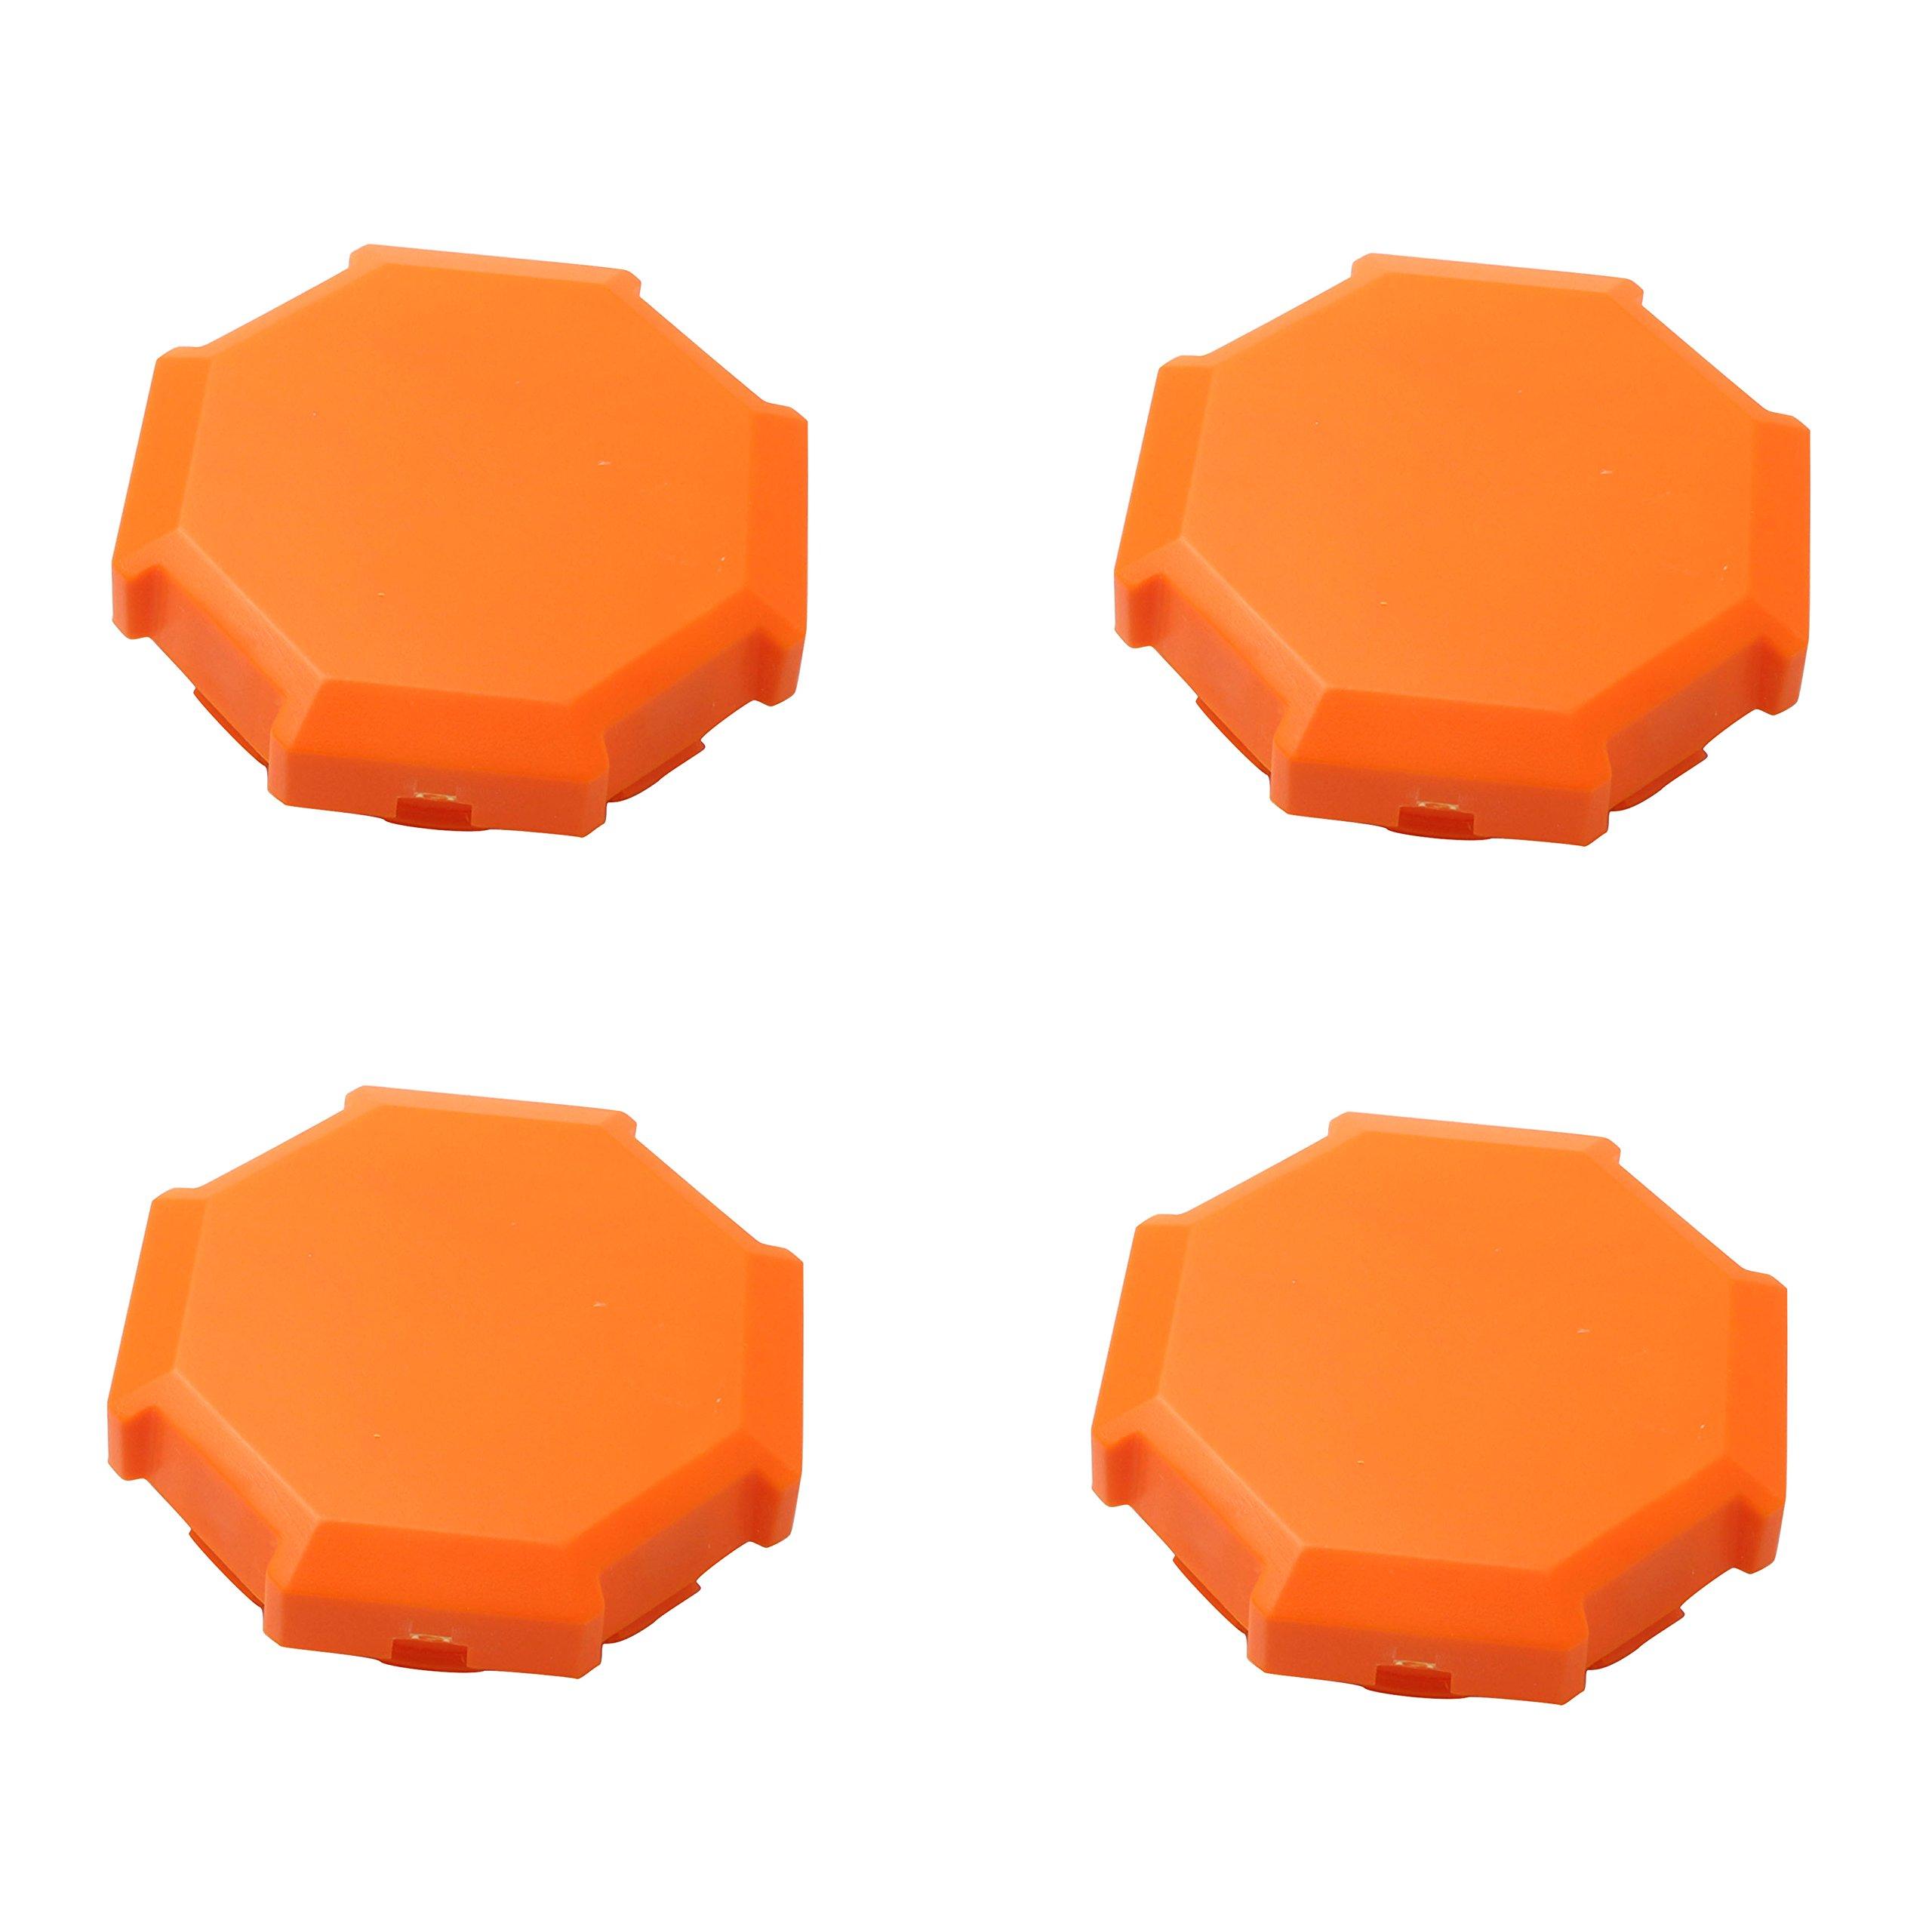 CPOWACE 4-Pack Hub Caps Wheel Center Caps For Polaris RZR 900 1000 XP 4 1522216-655 (Orange)